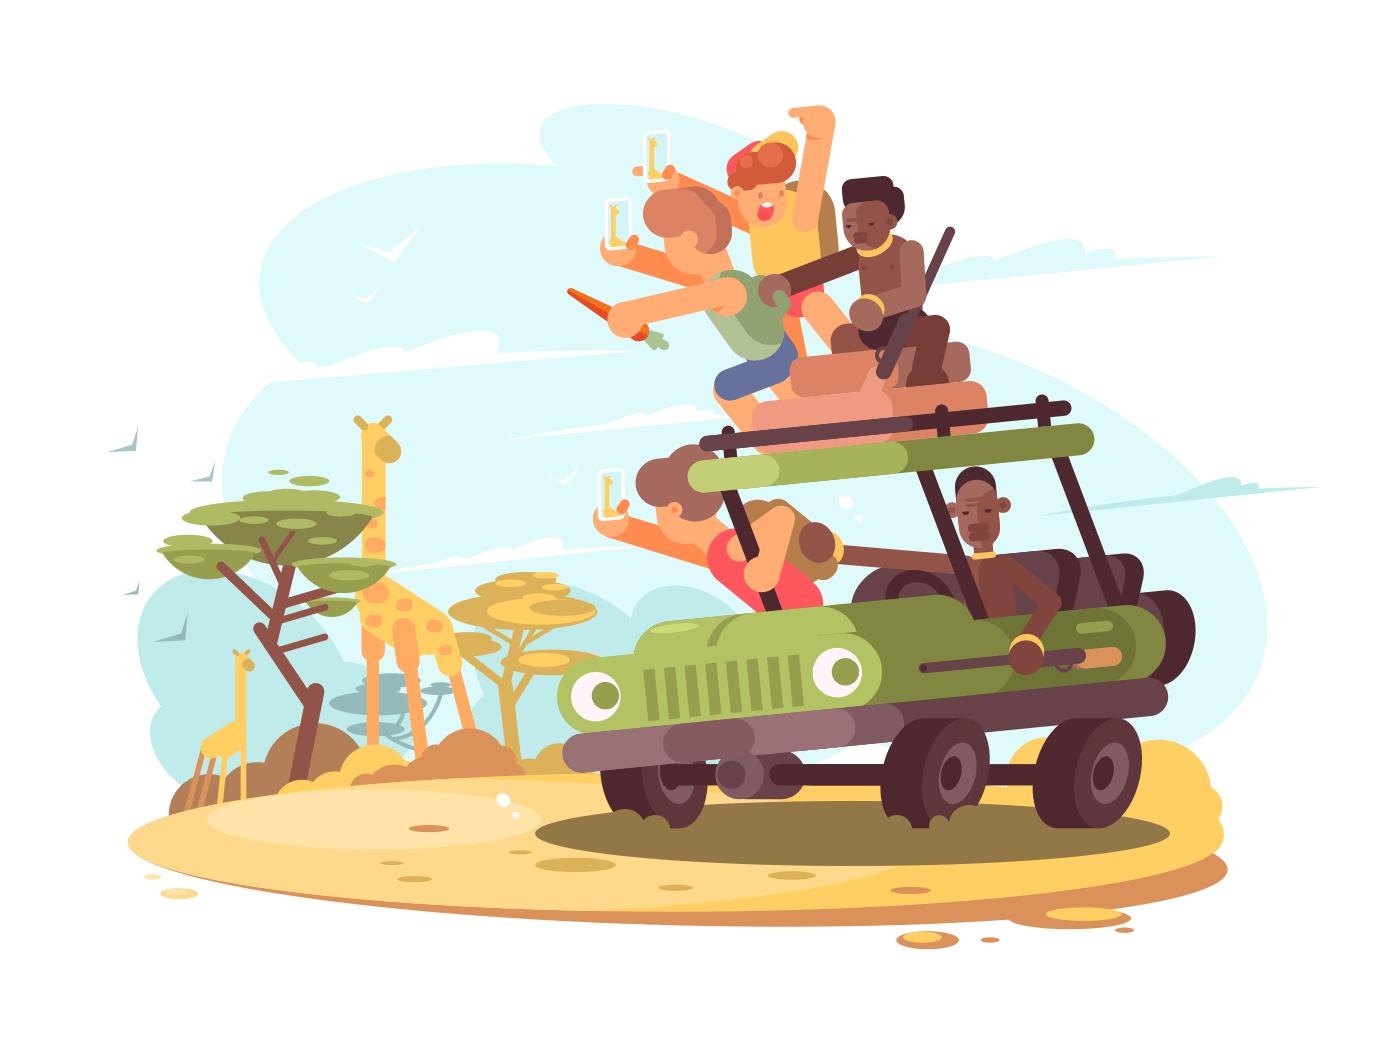 Group of tourists on safari illustration